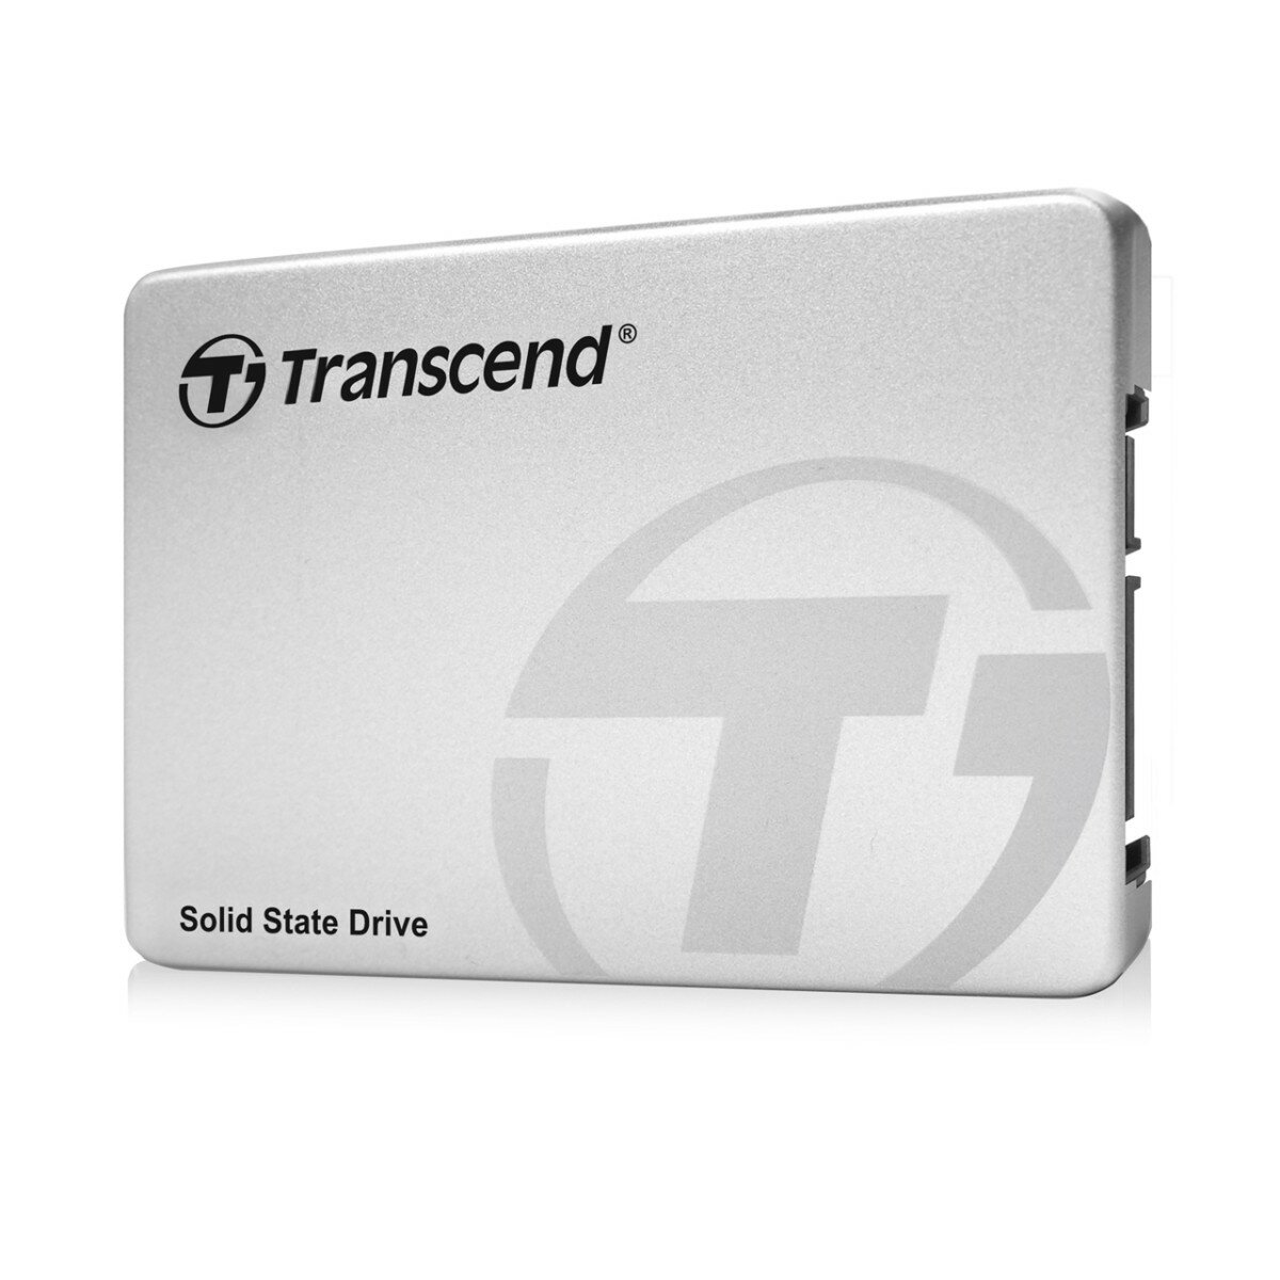 Transcend SSD 2.5インチ 120GB SATA-III対応 6Gb/s[TS120GSSD220S]【送料無料】